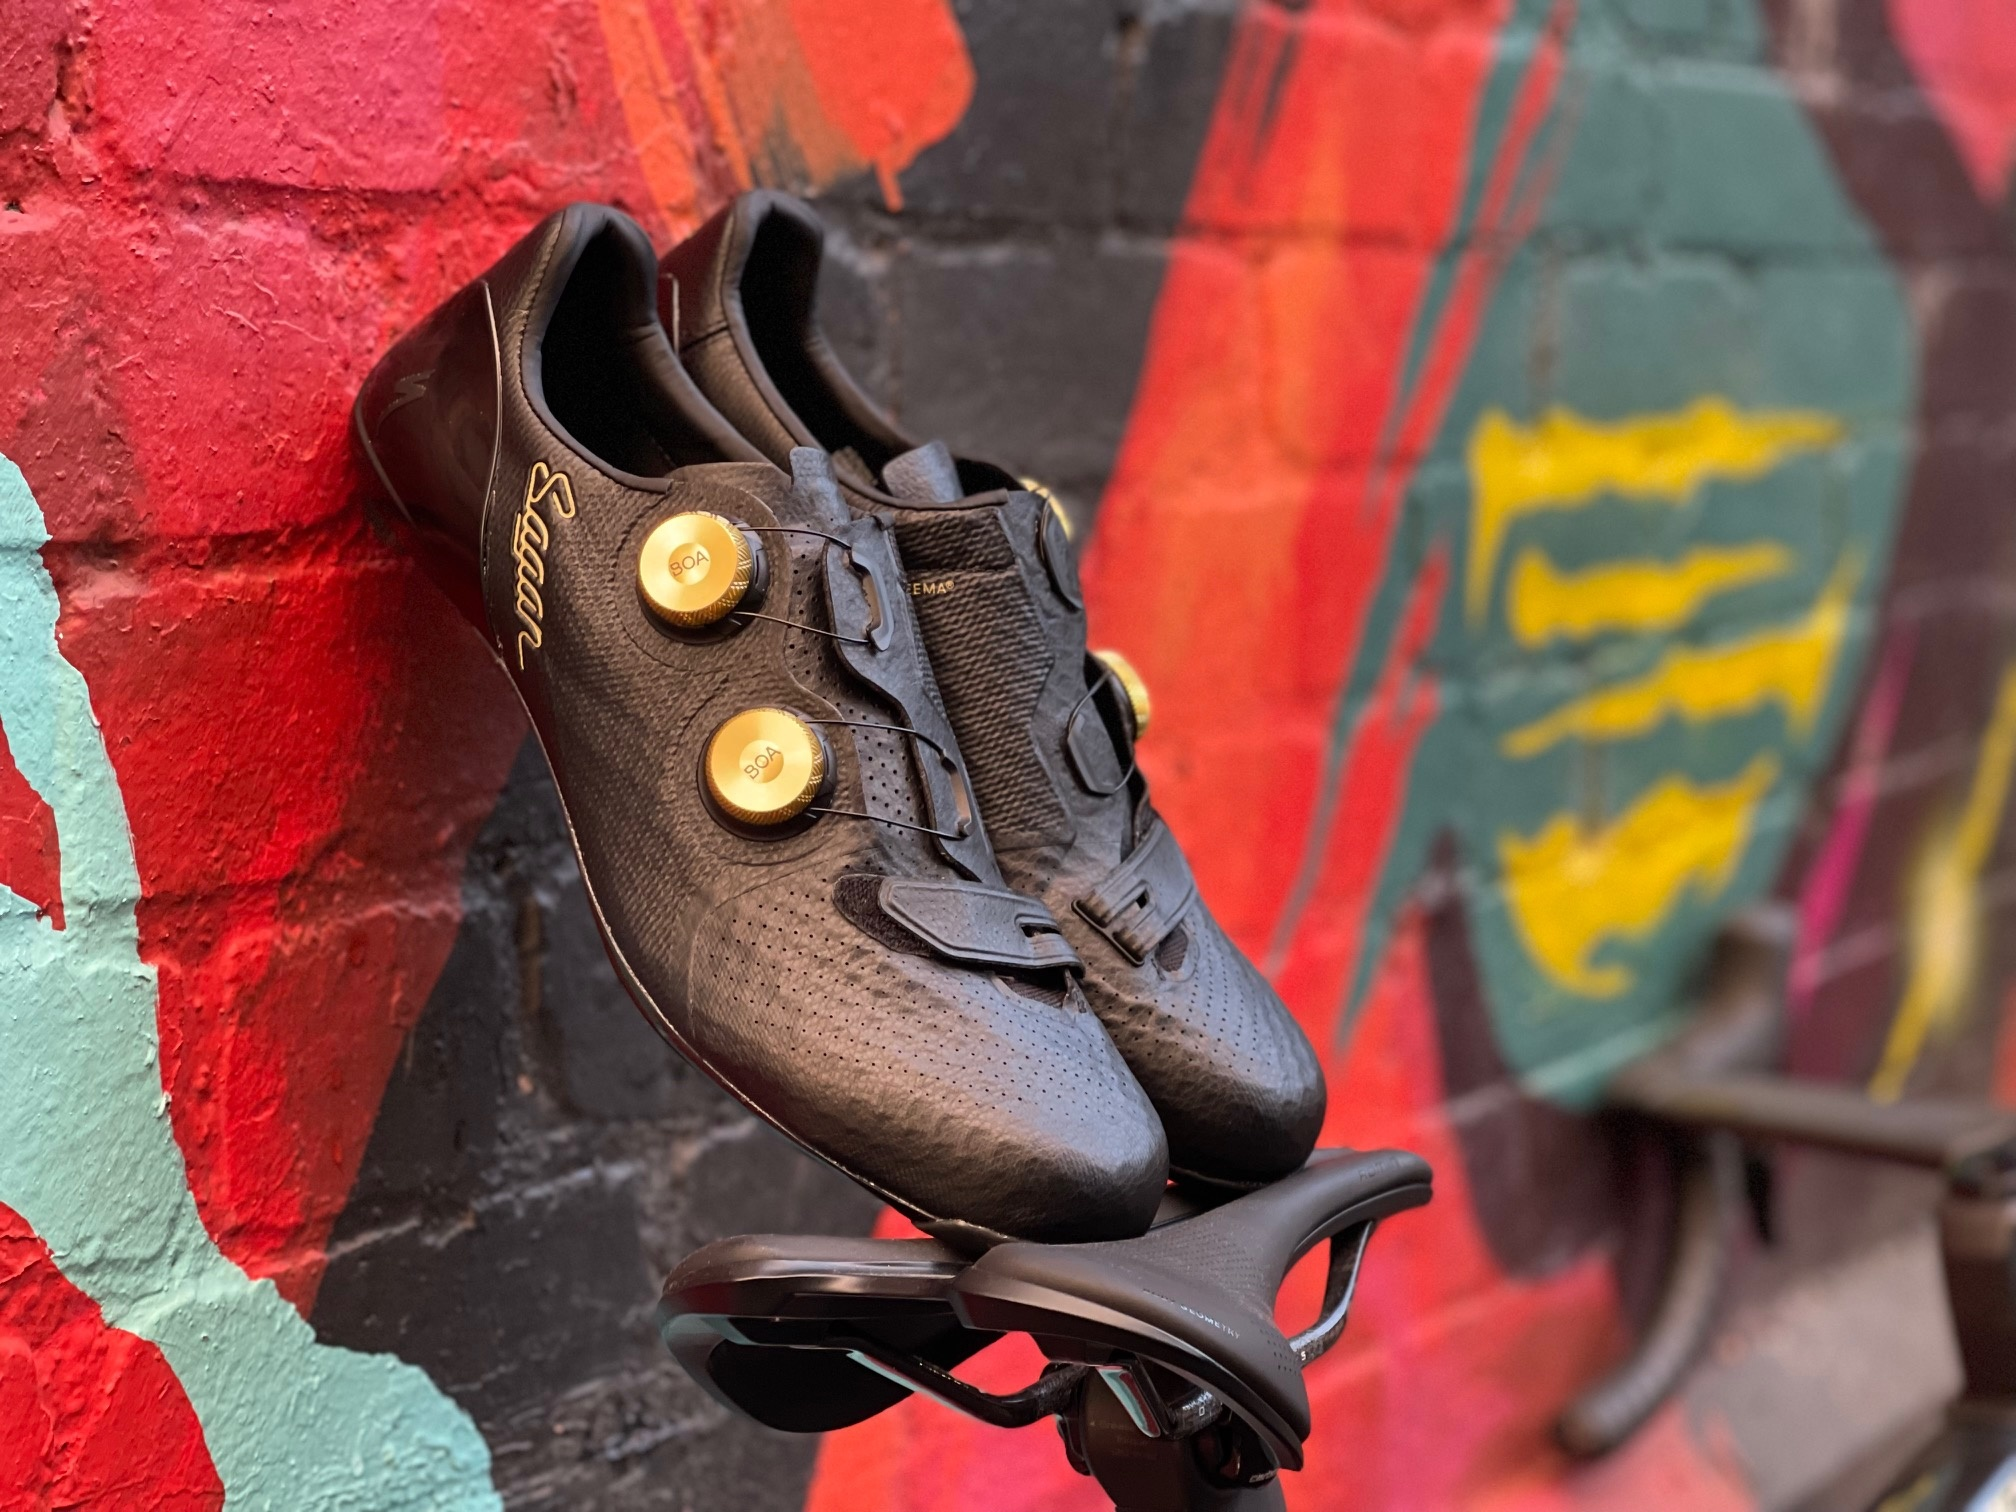 Specialized S-Works Road 7 Shoe Sagan Disruption Ltd Blk